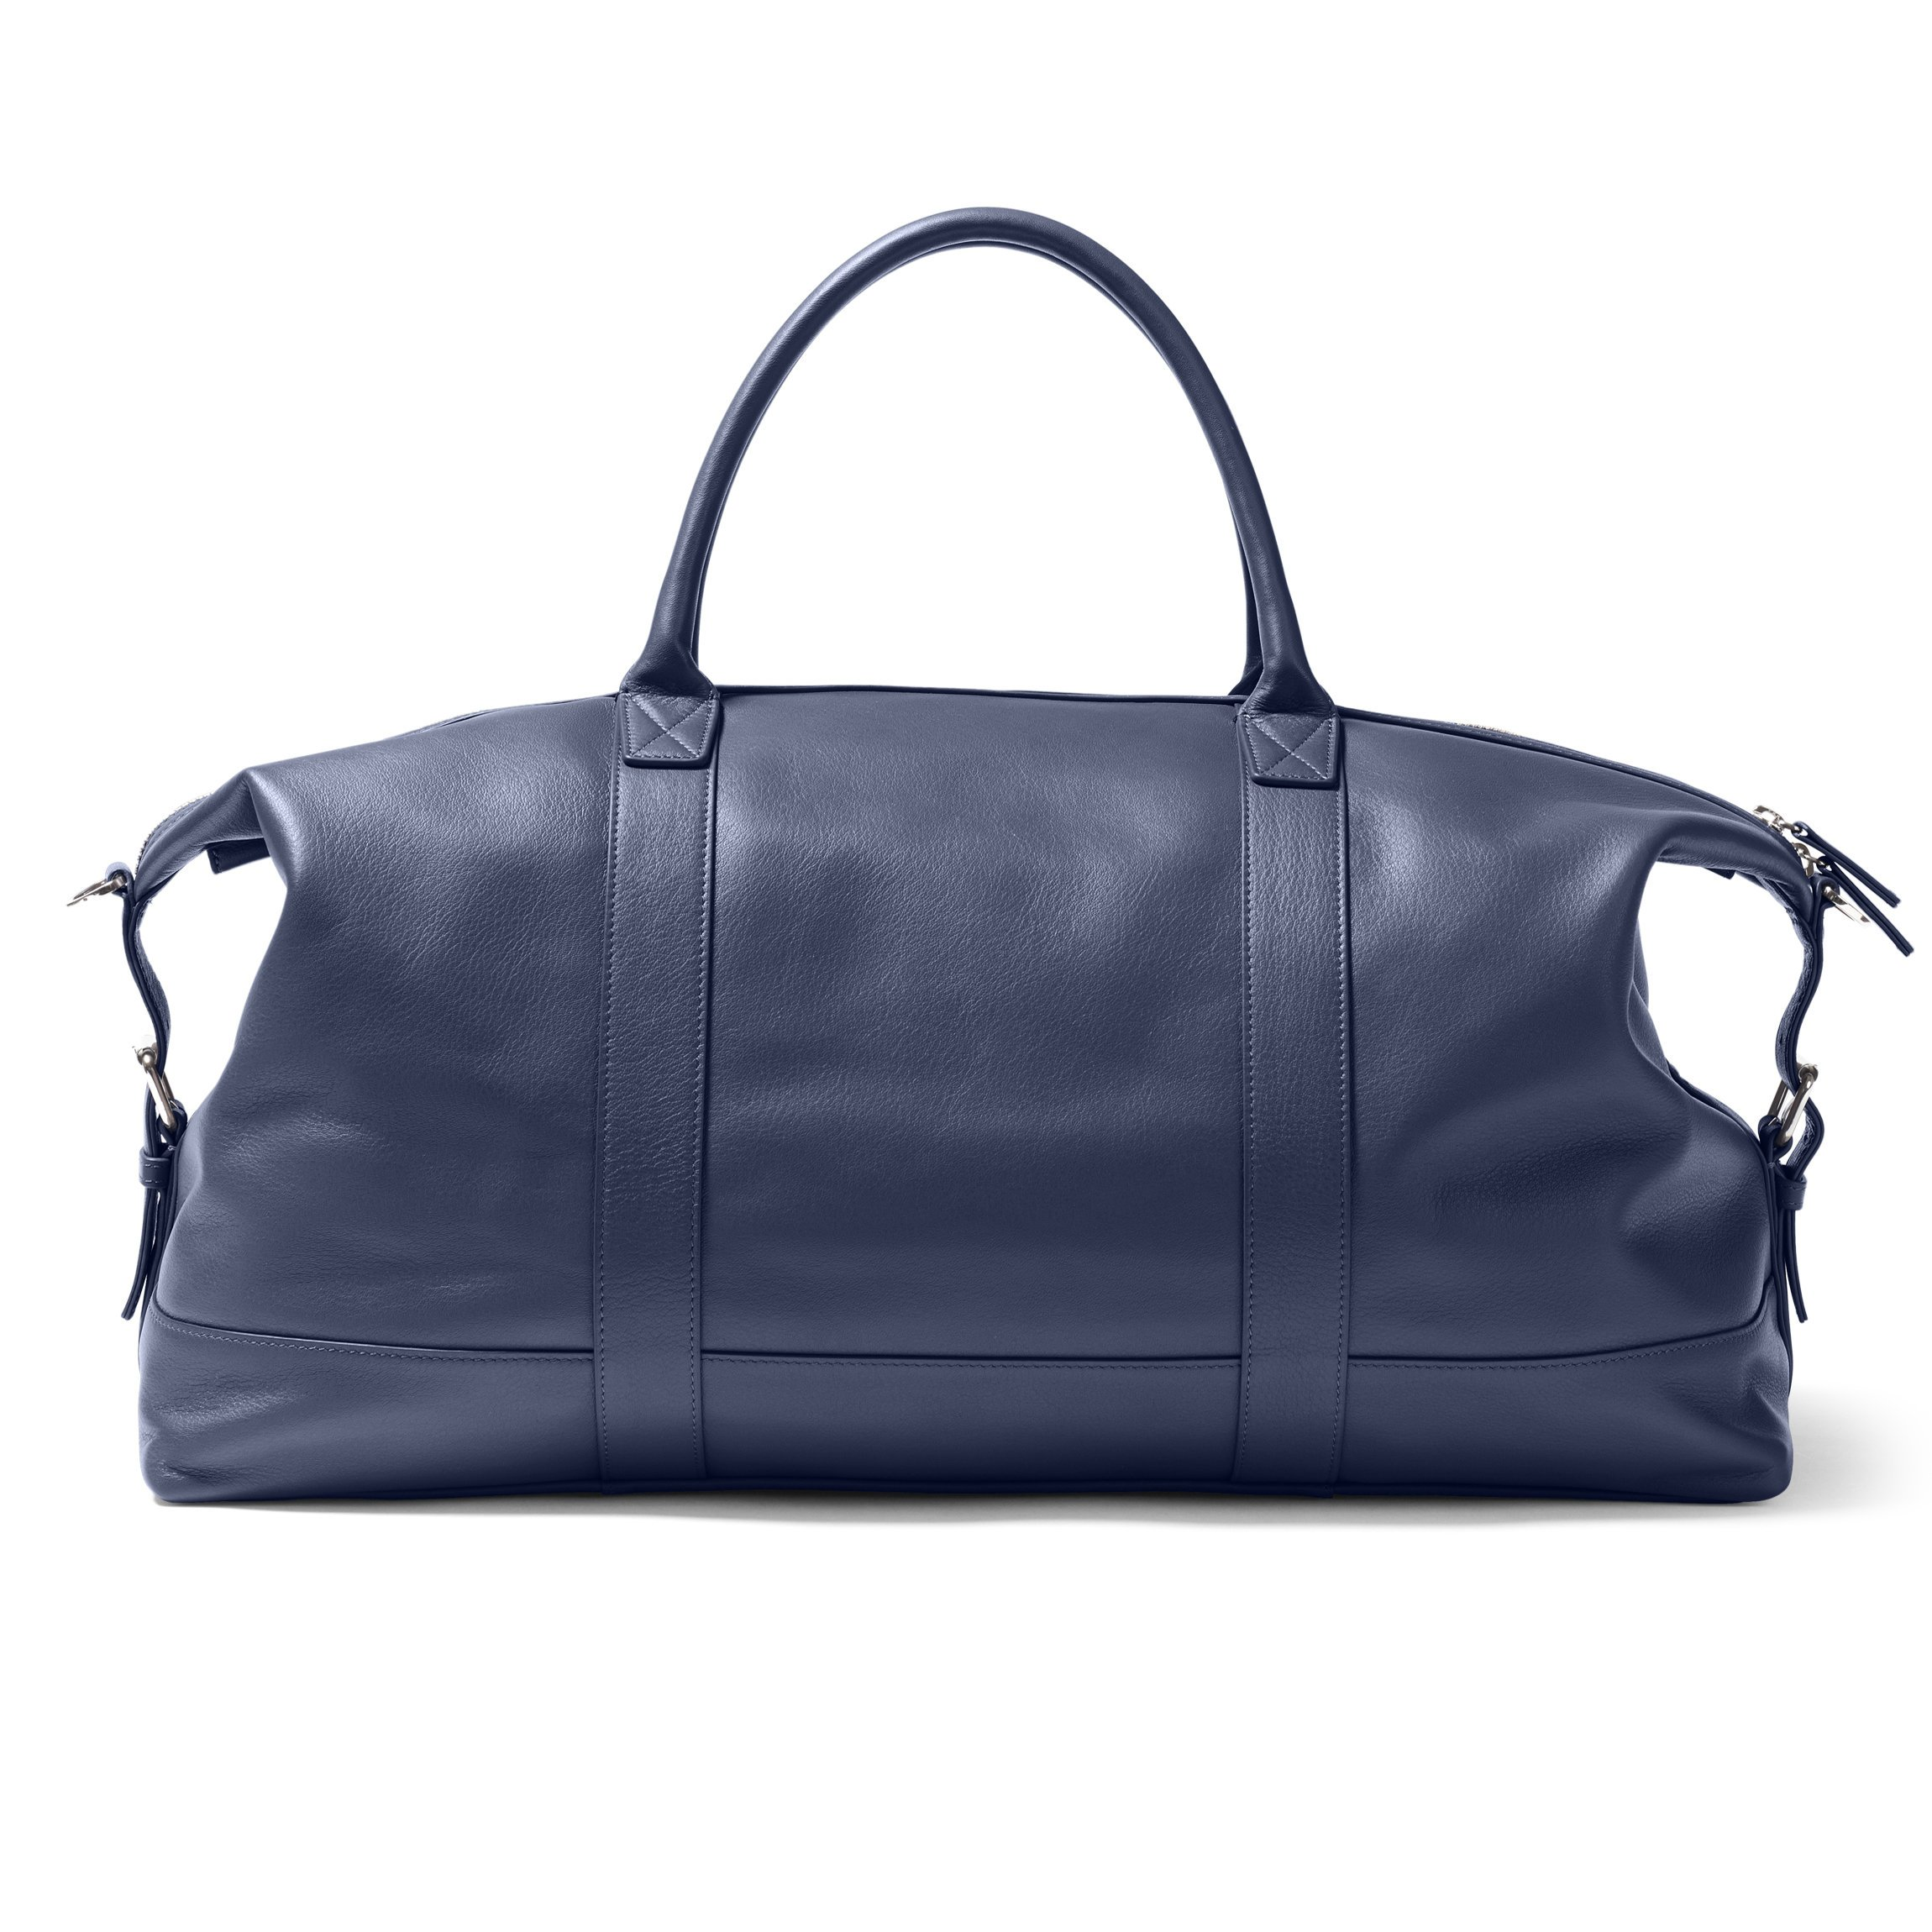 Kessler Medium Duffle - Full Grain Leather Leather - Navy (blue) by Leatherology (Image #6)